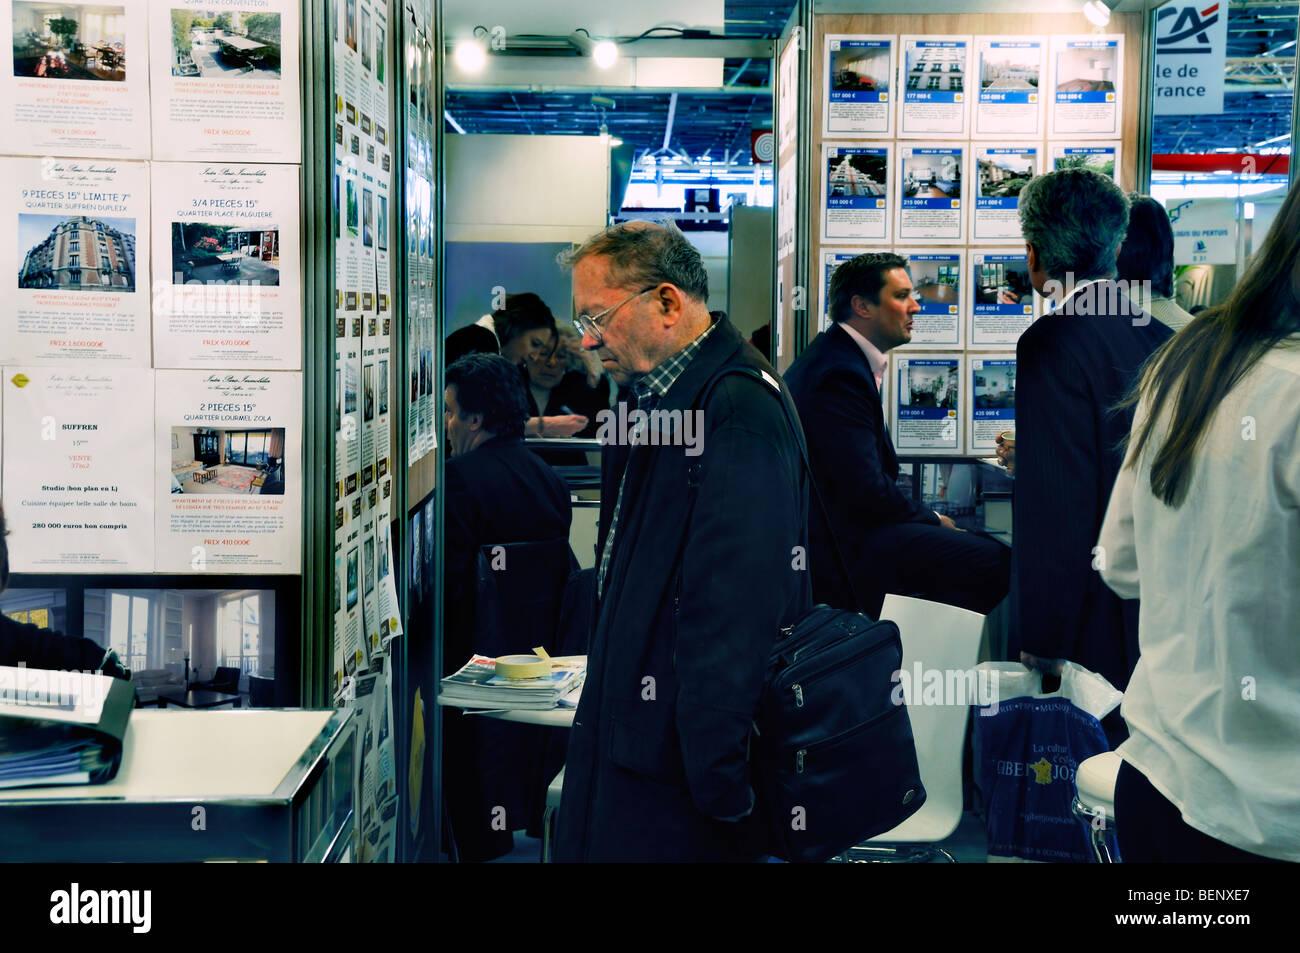 Paris, France - Senior Man Reading House Sales Ads, Interior View of Paris 'Real Estate' Annual Exhibit - Stock Image